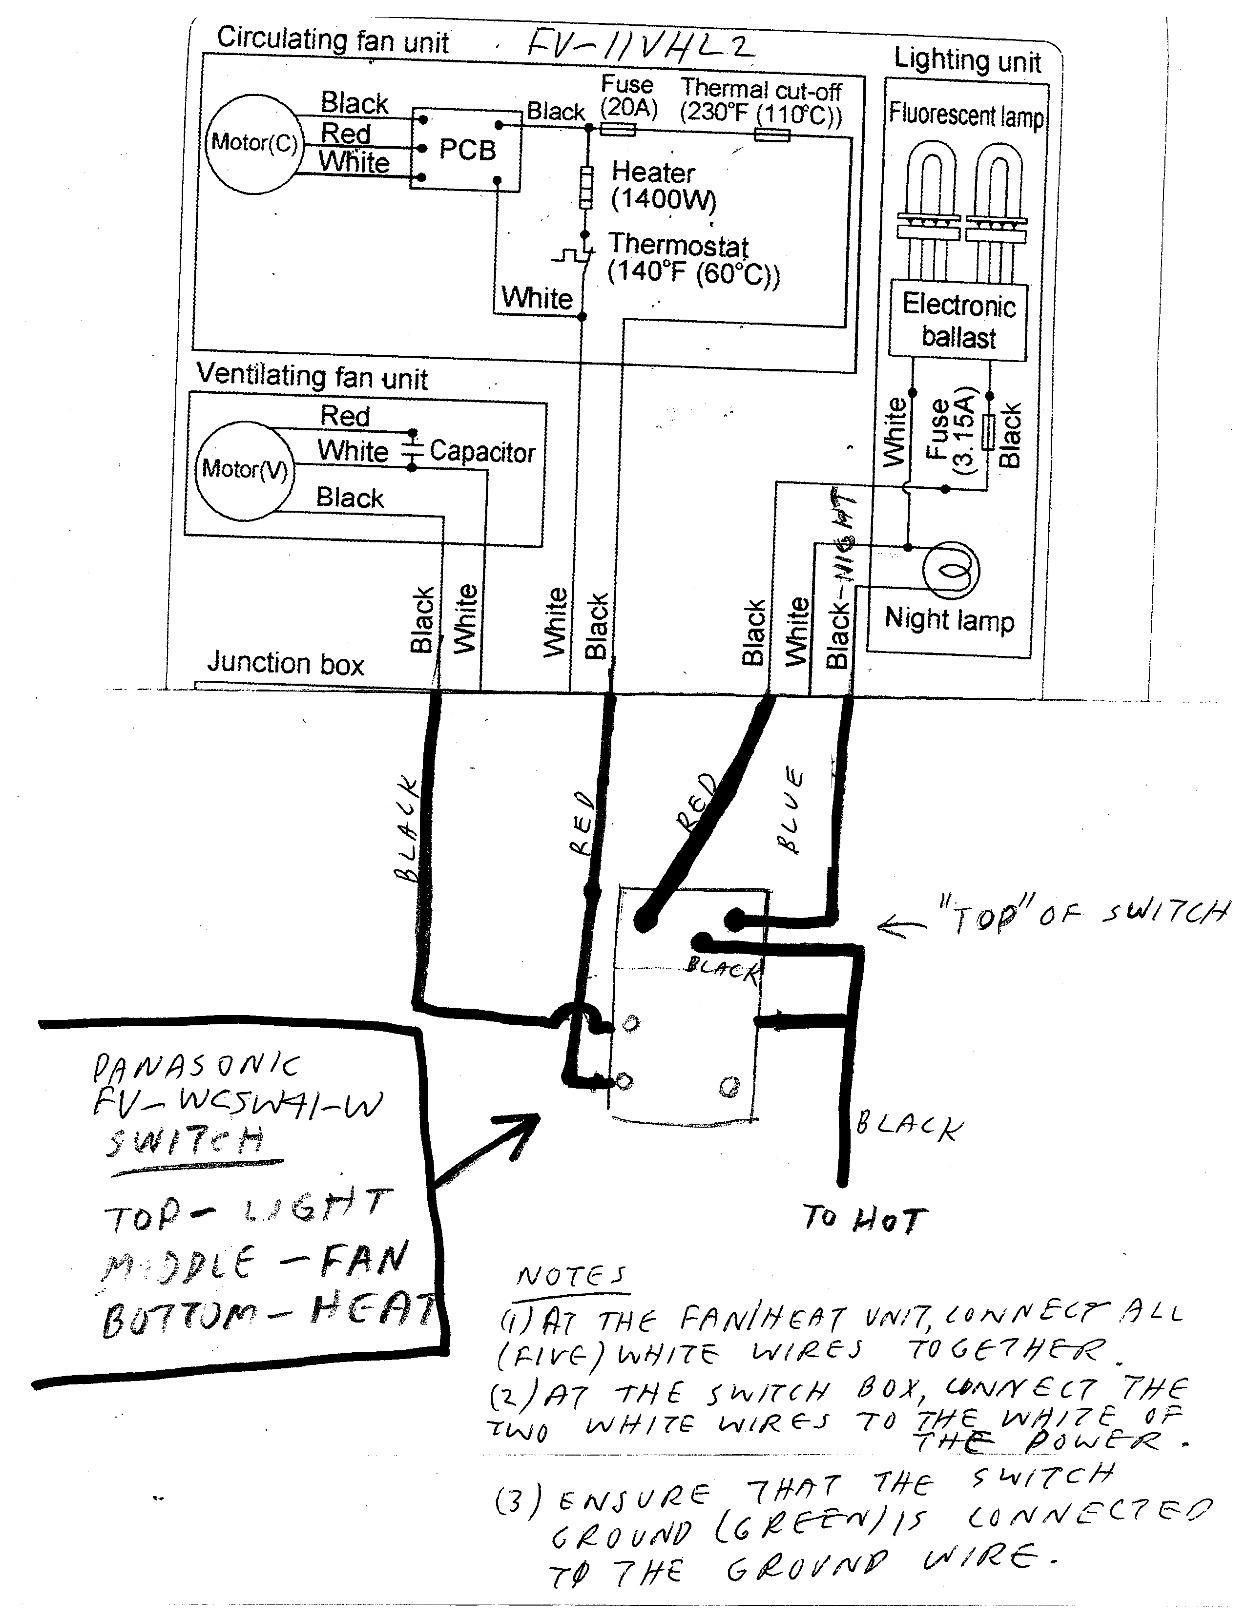 Panasonic Fan Switch Wiring Diagram